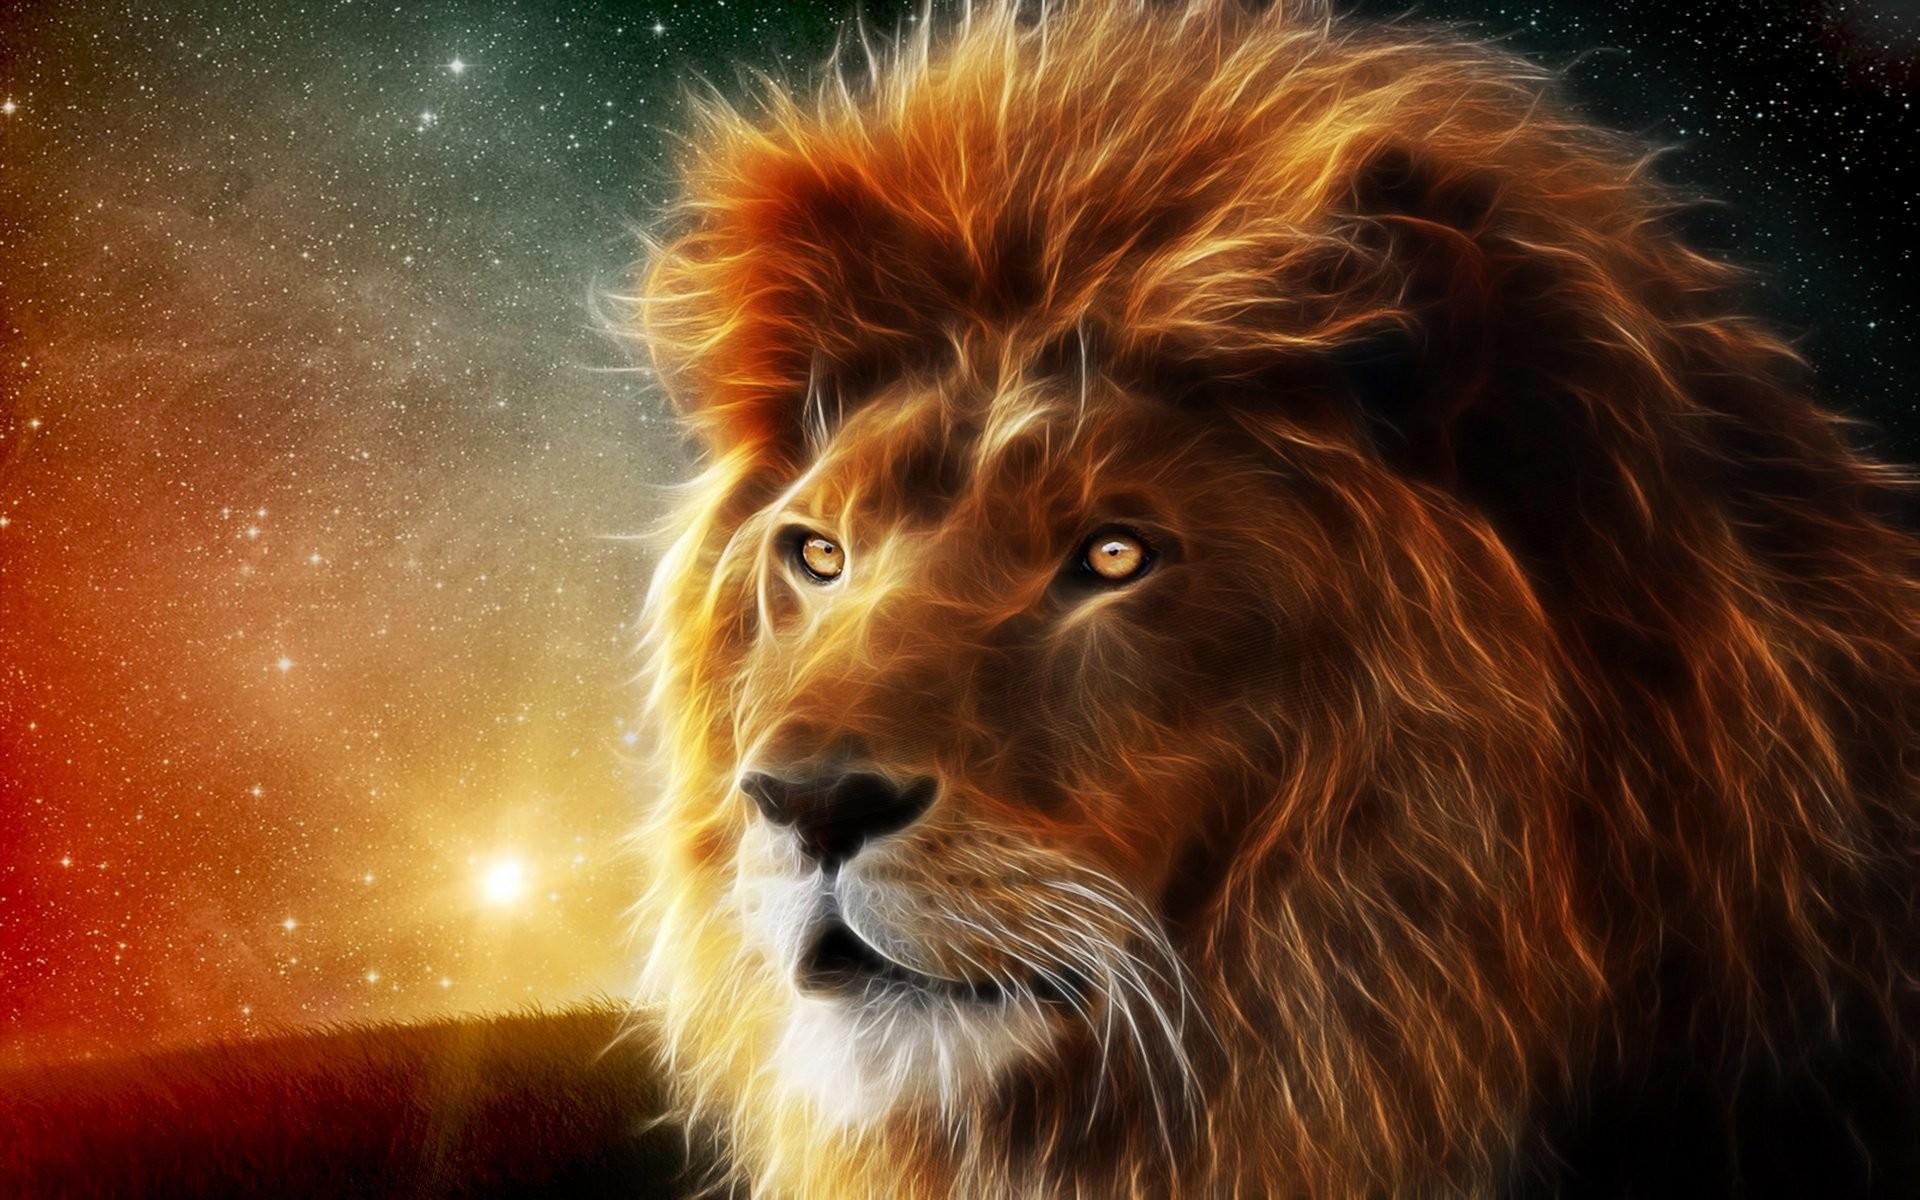 Lion Background Download Free Full Hd Backgrounds For Desktop